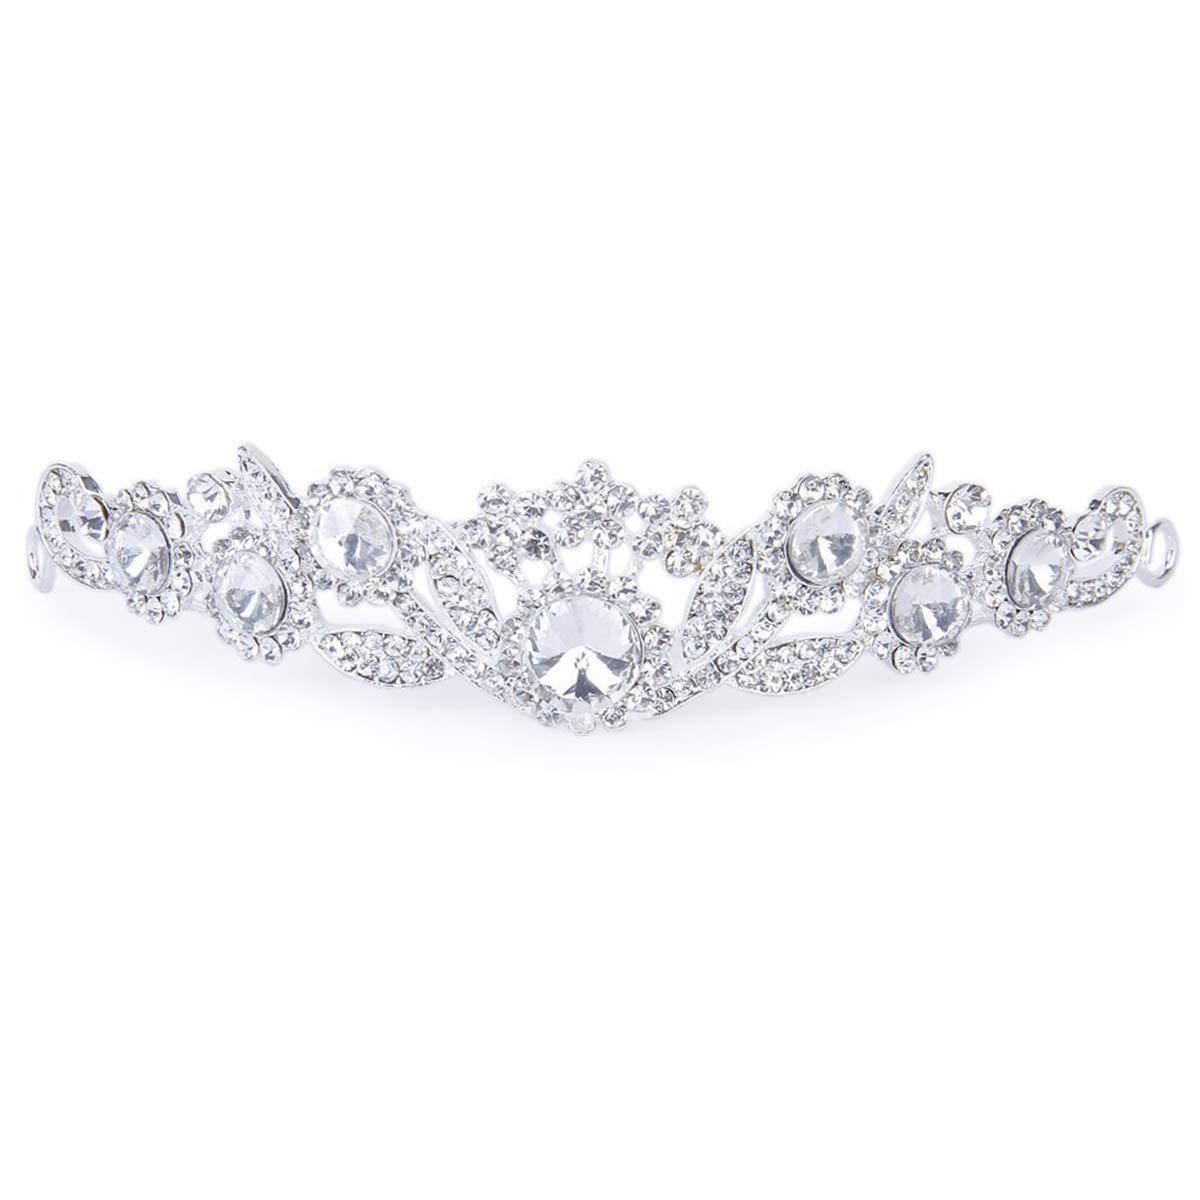 Tinksky Wedding Bridal Crystal Rhinestone Hair Barrettes Hairband Hair Loop (Sliver)